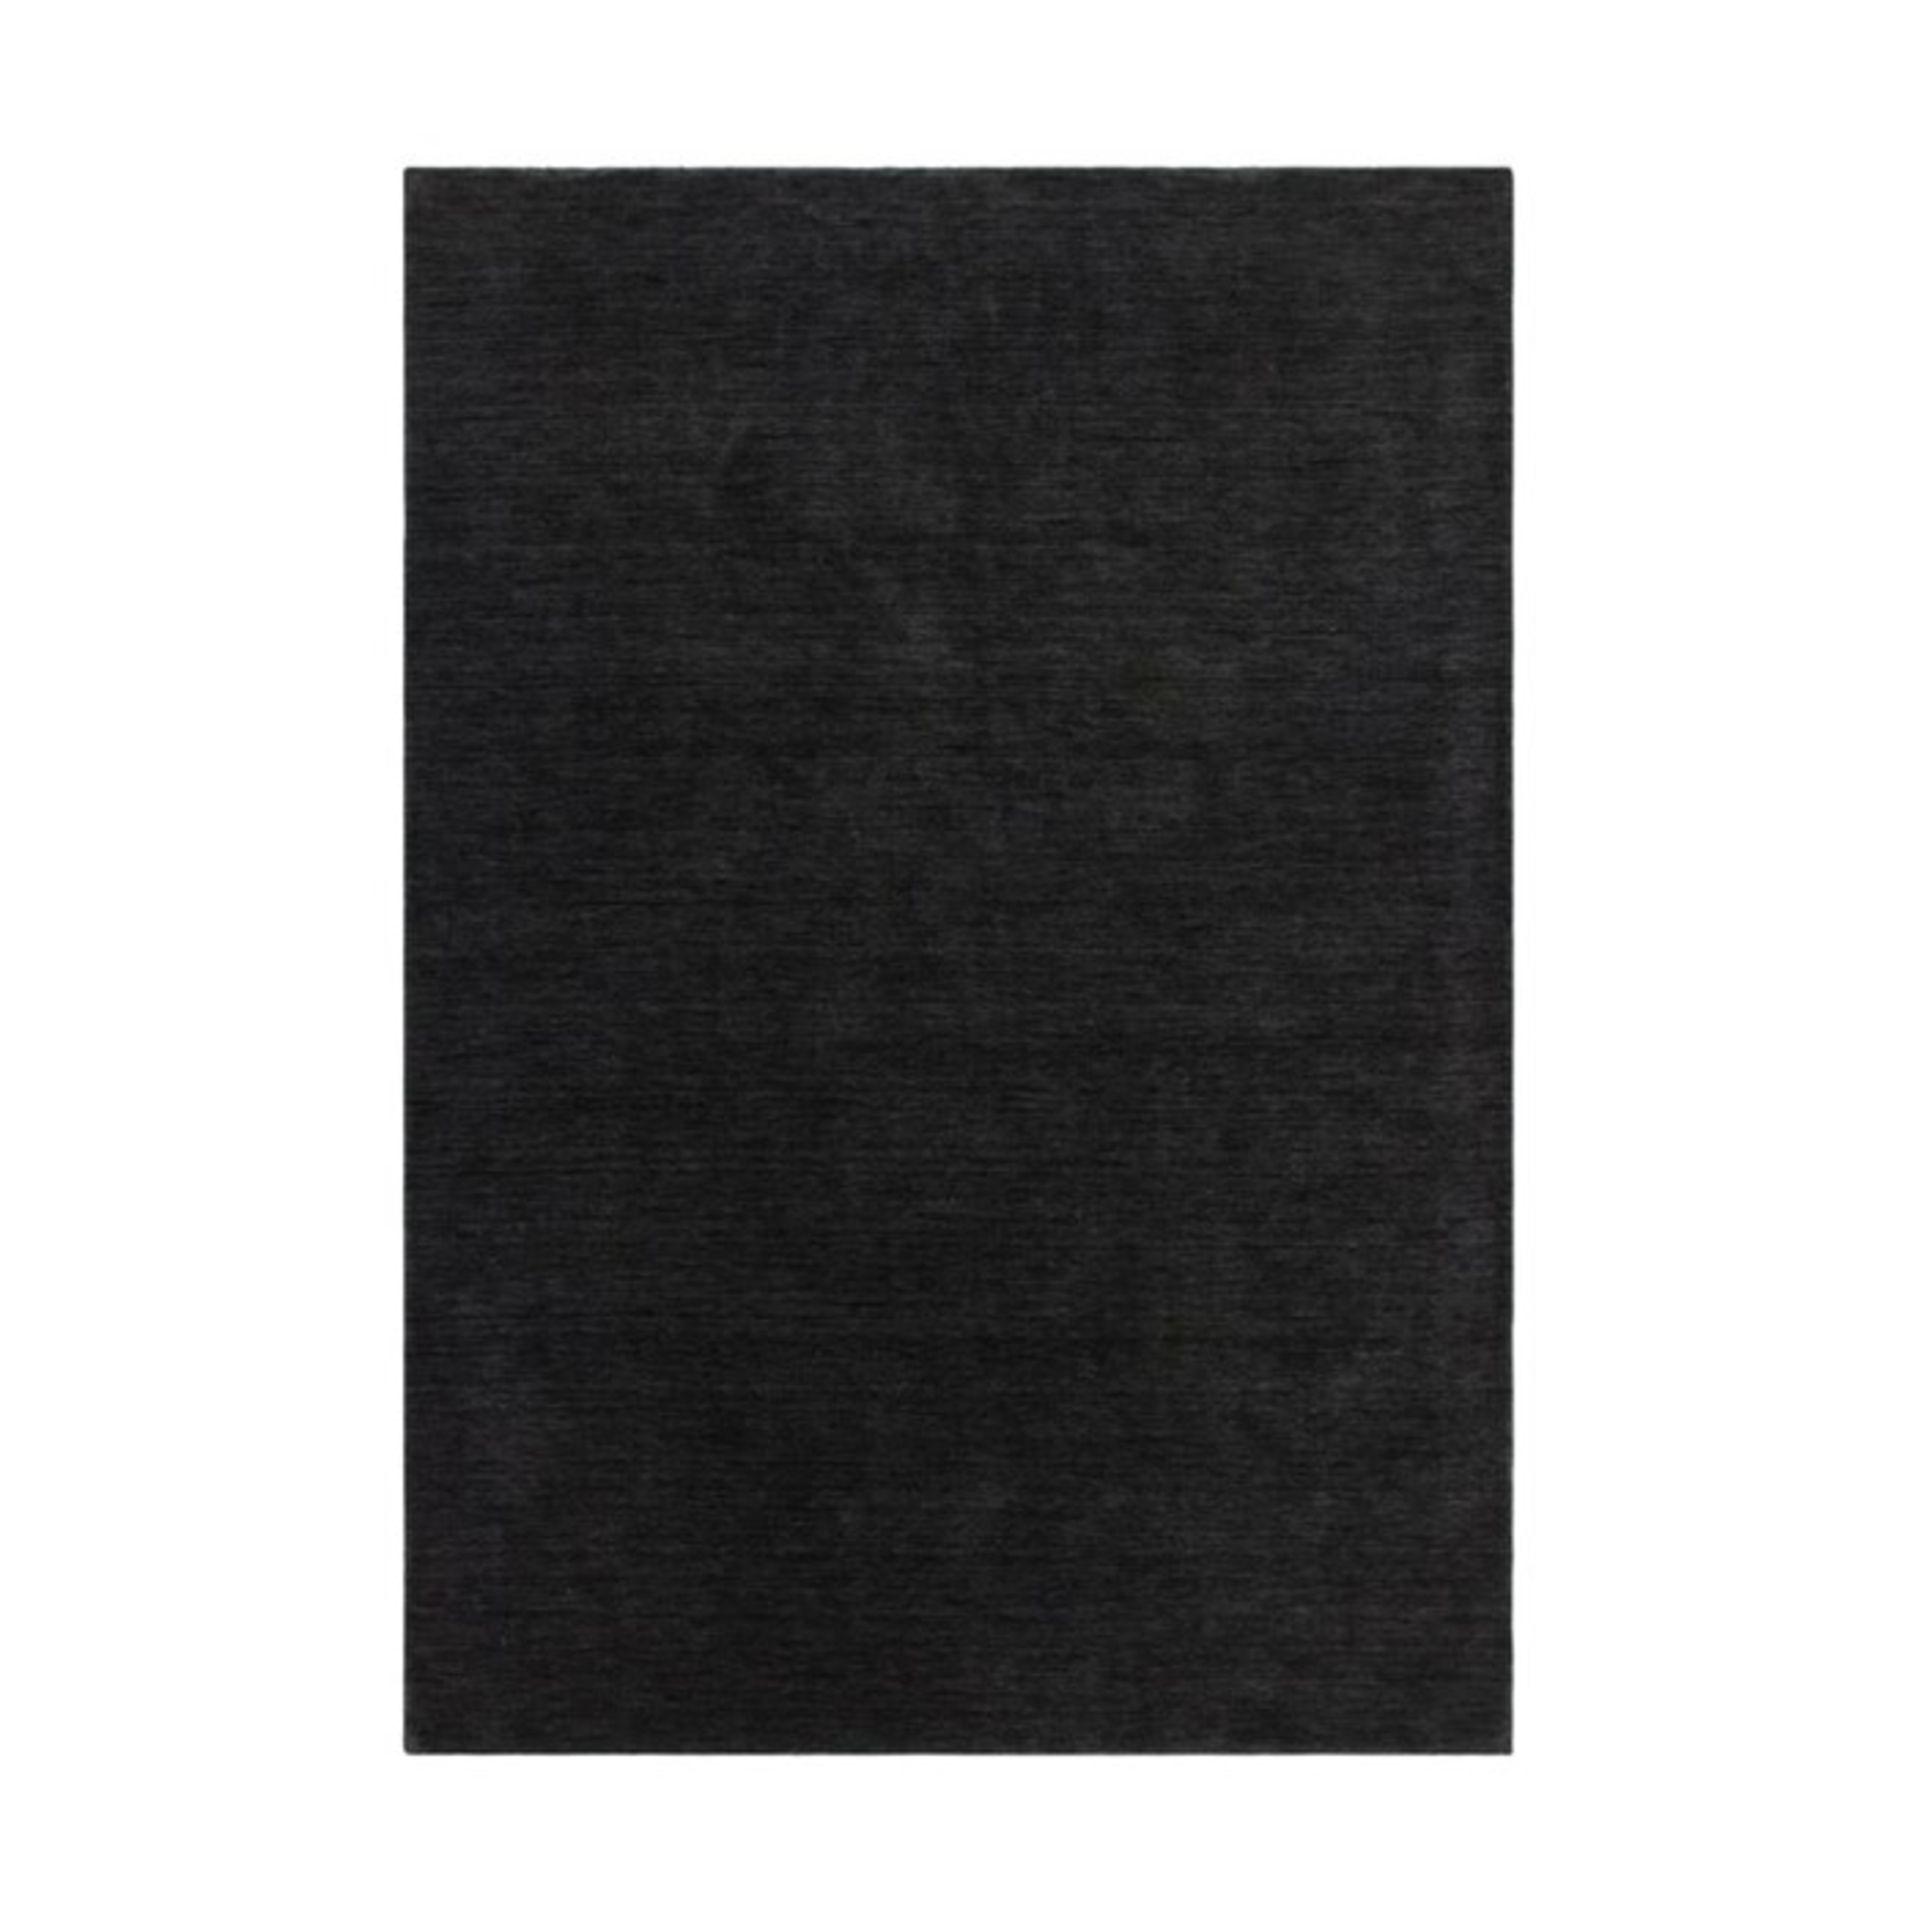 Kayoom,Belize - Belmopan Handwoven Wool Graphite Rug RRP -£165.99 (120x170cm)(11989/8 -KAYM1649)